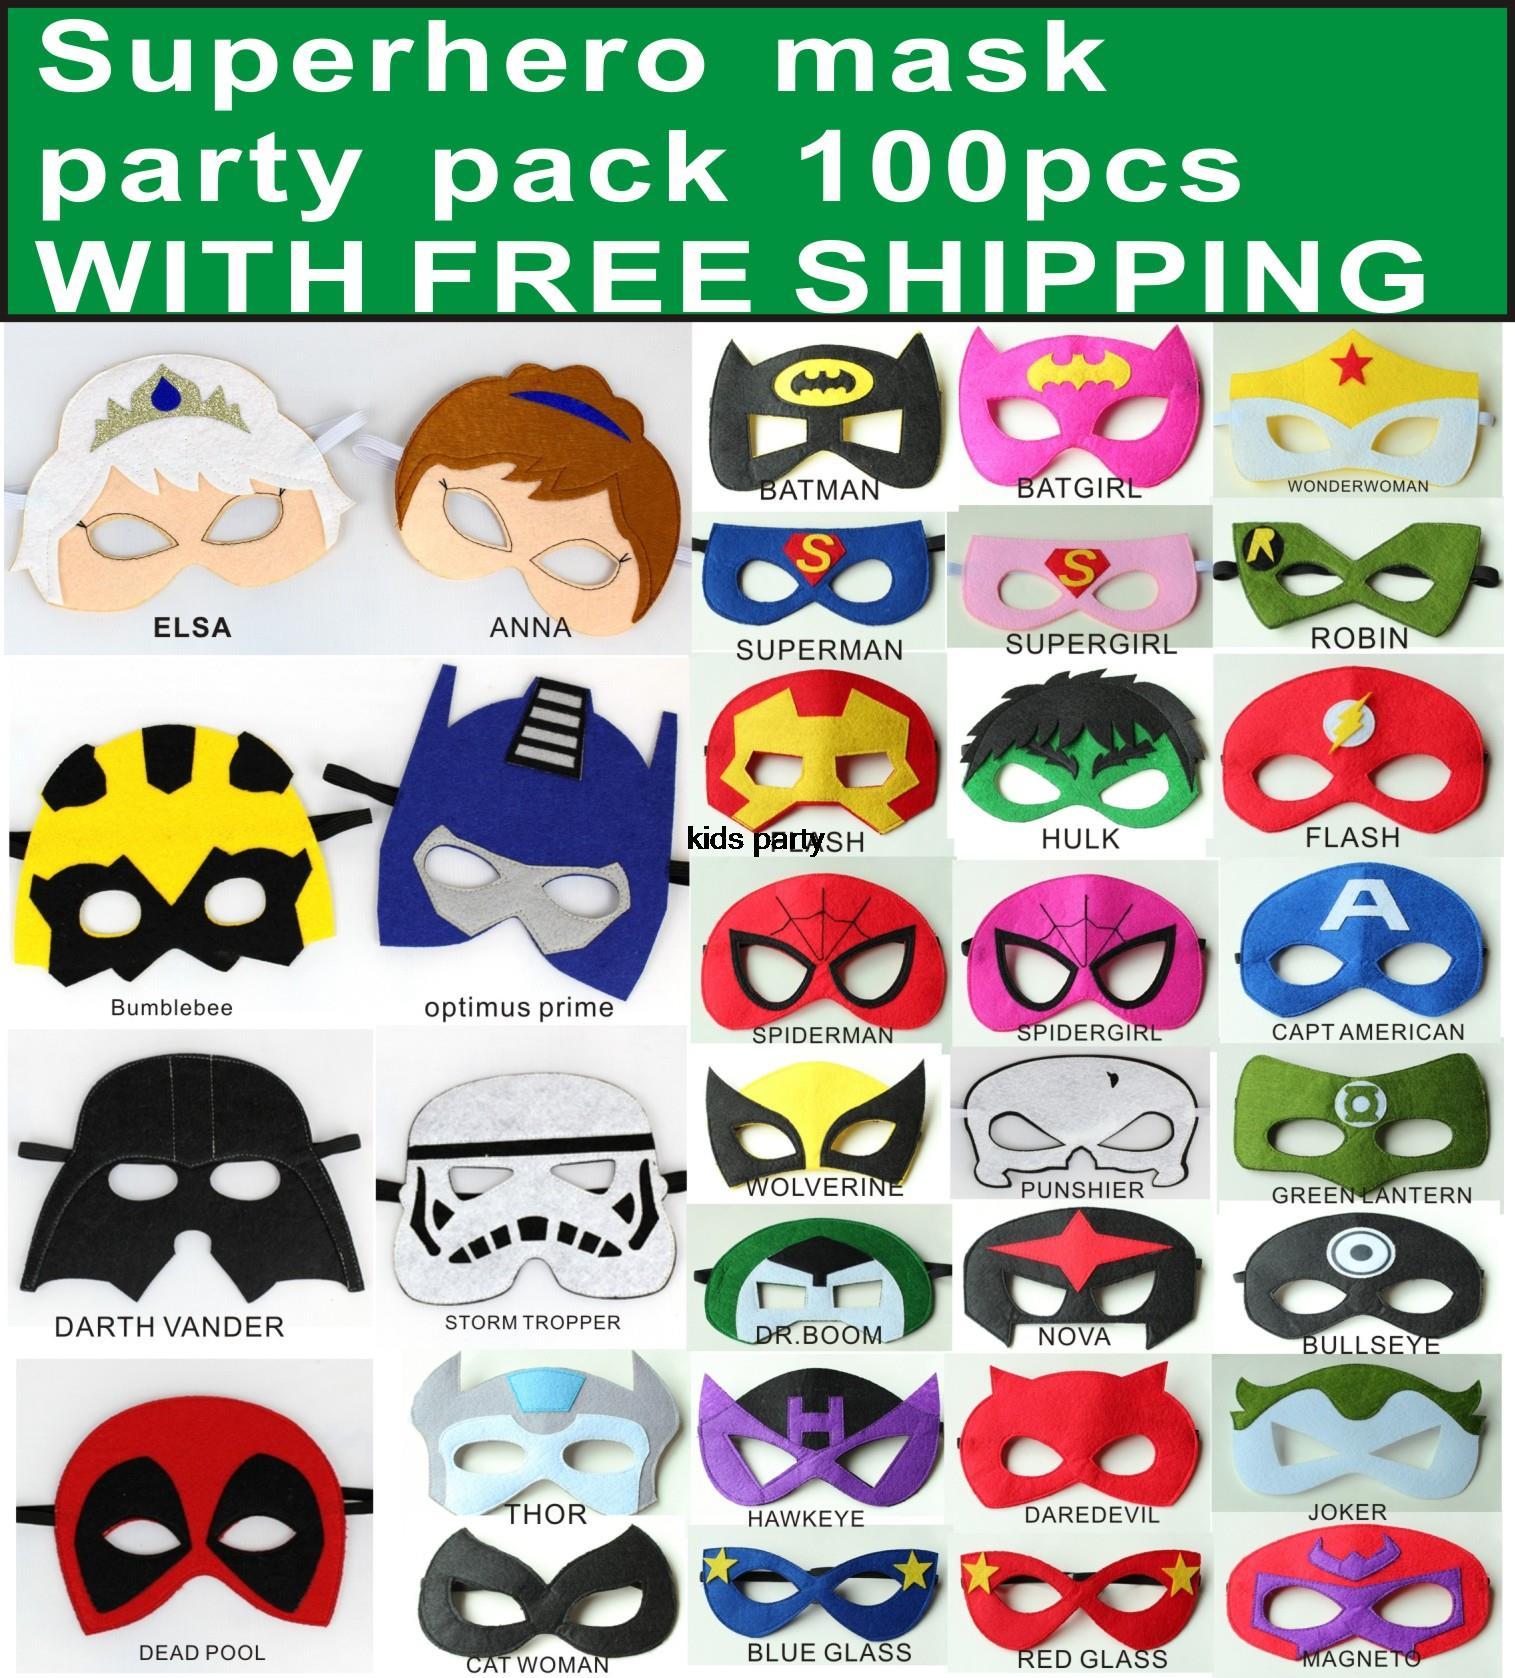 100pcs felt mask hallown mask costume mask kids costume accessories batman elsa deadpool tmnt starwars darth vader storm